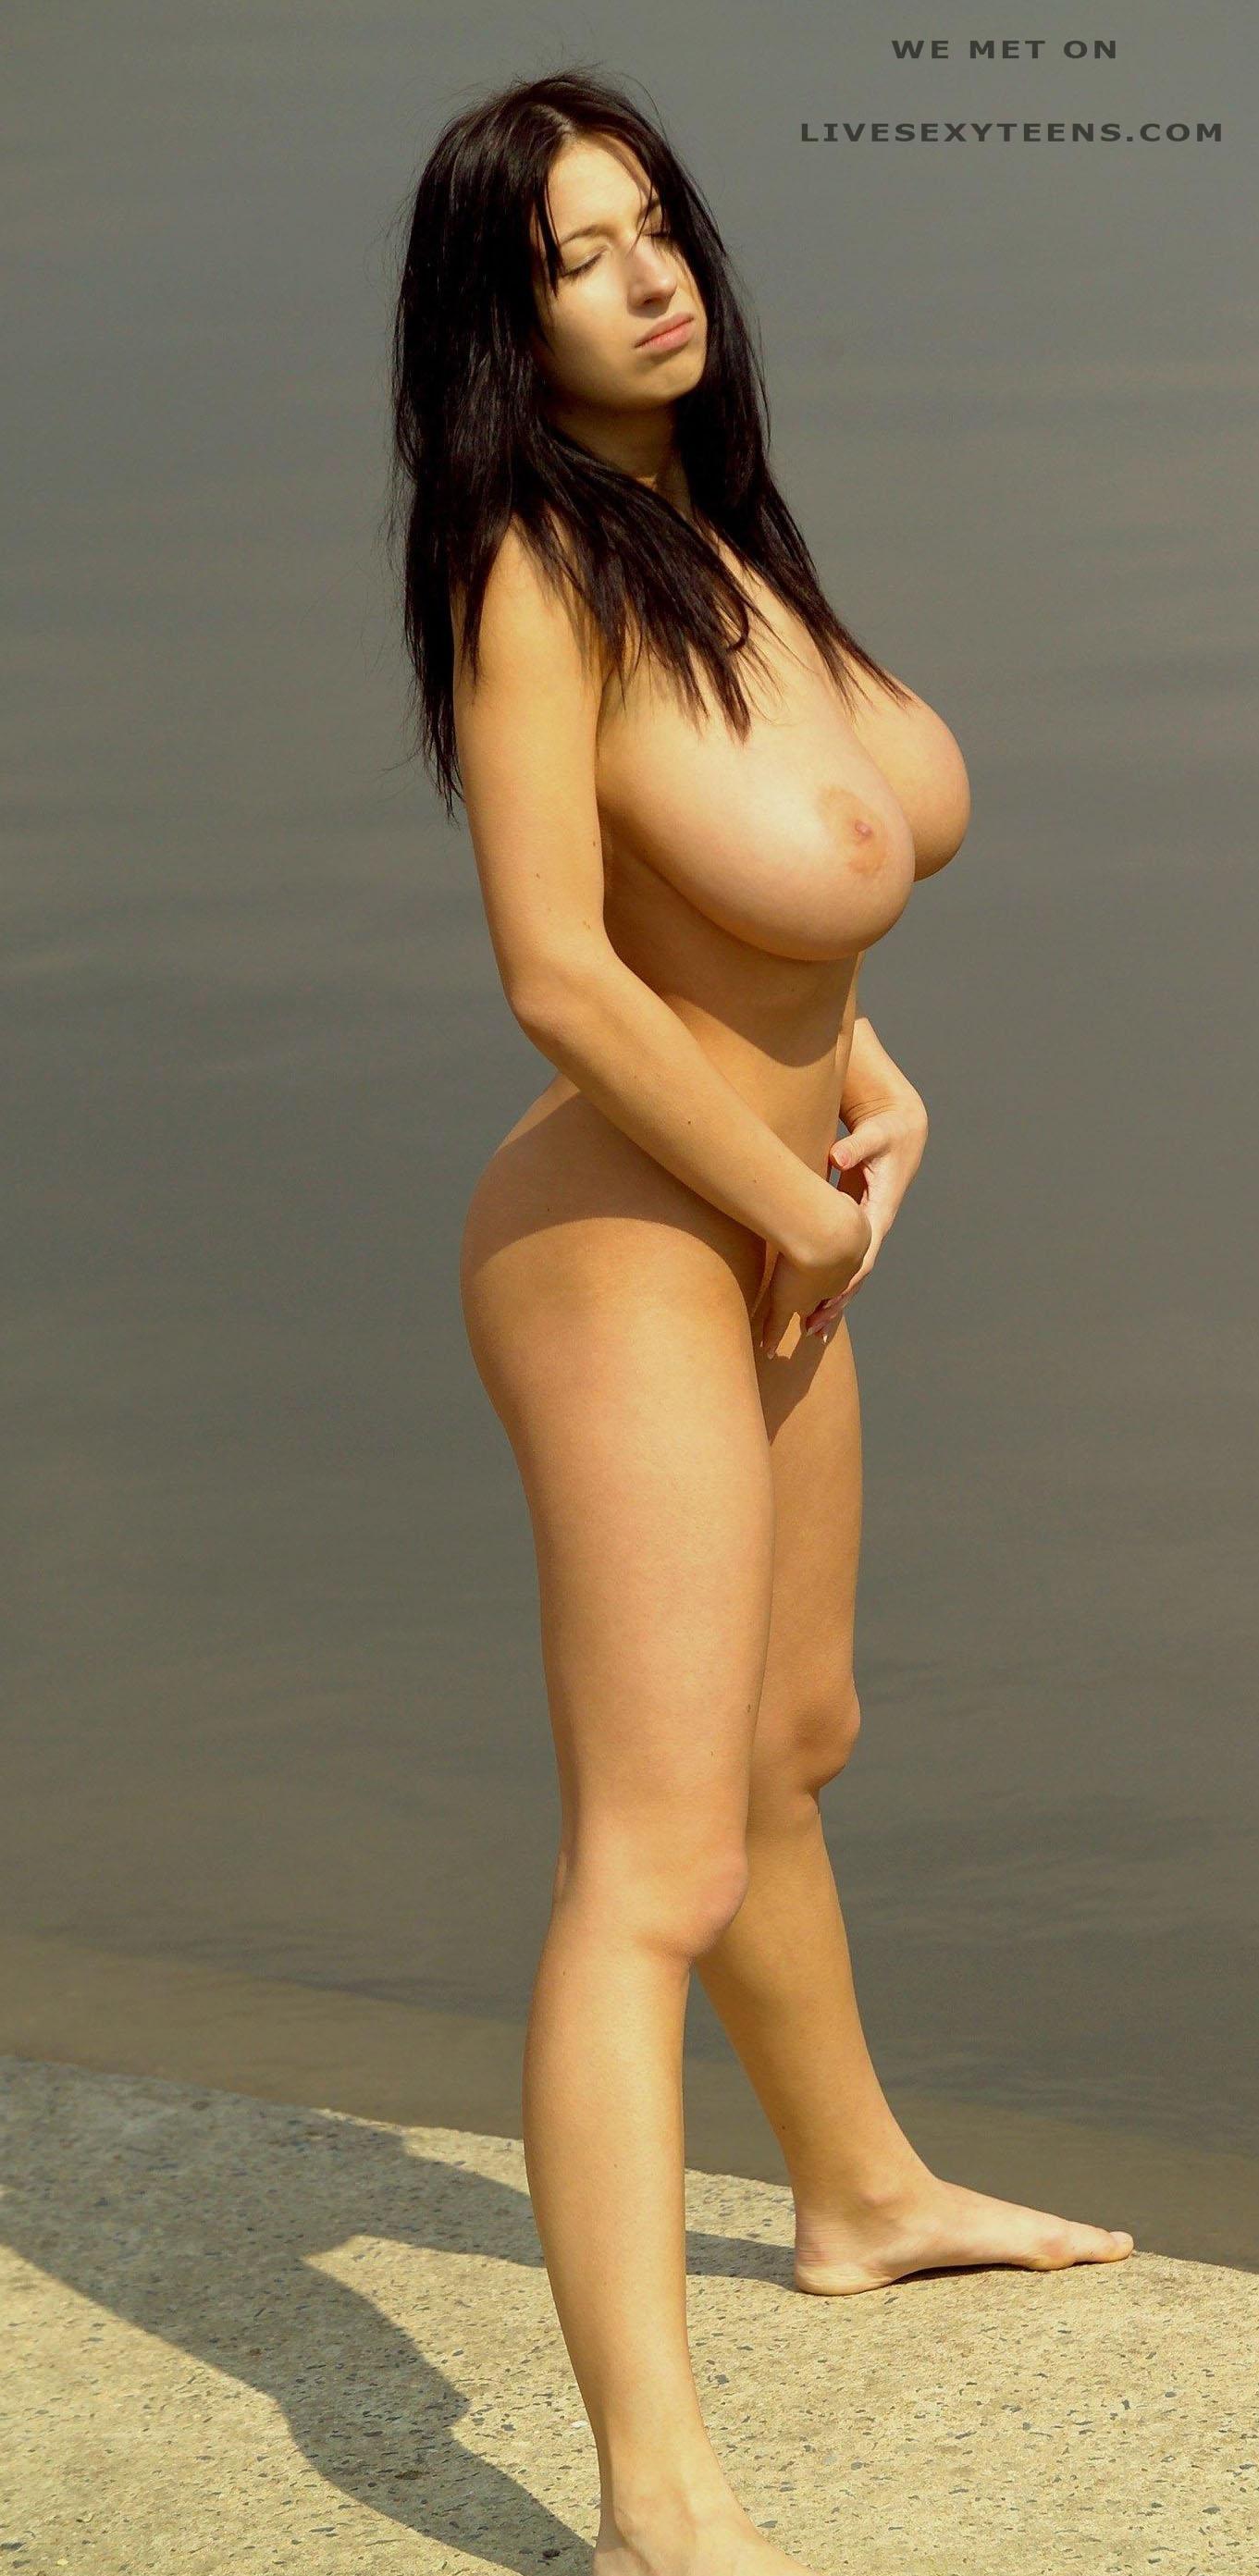 Jana defi naked